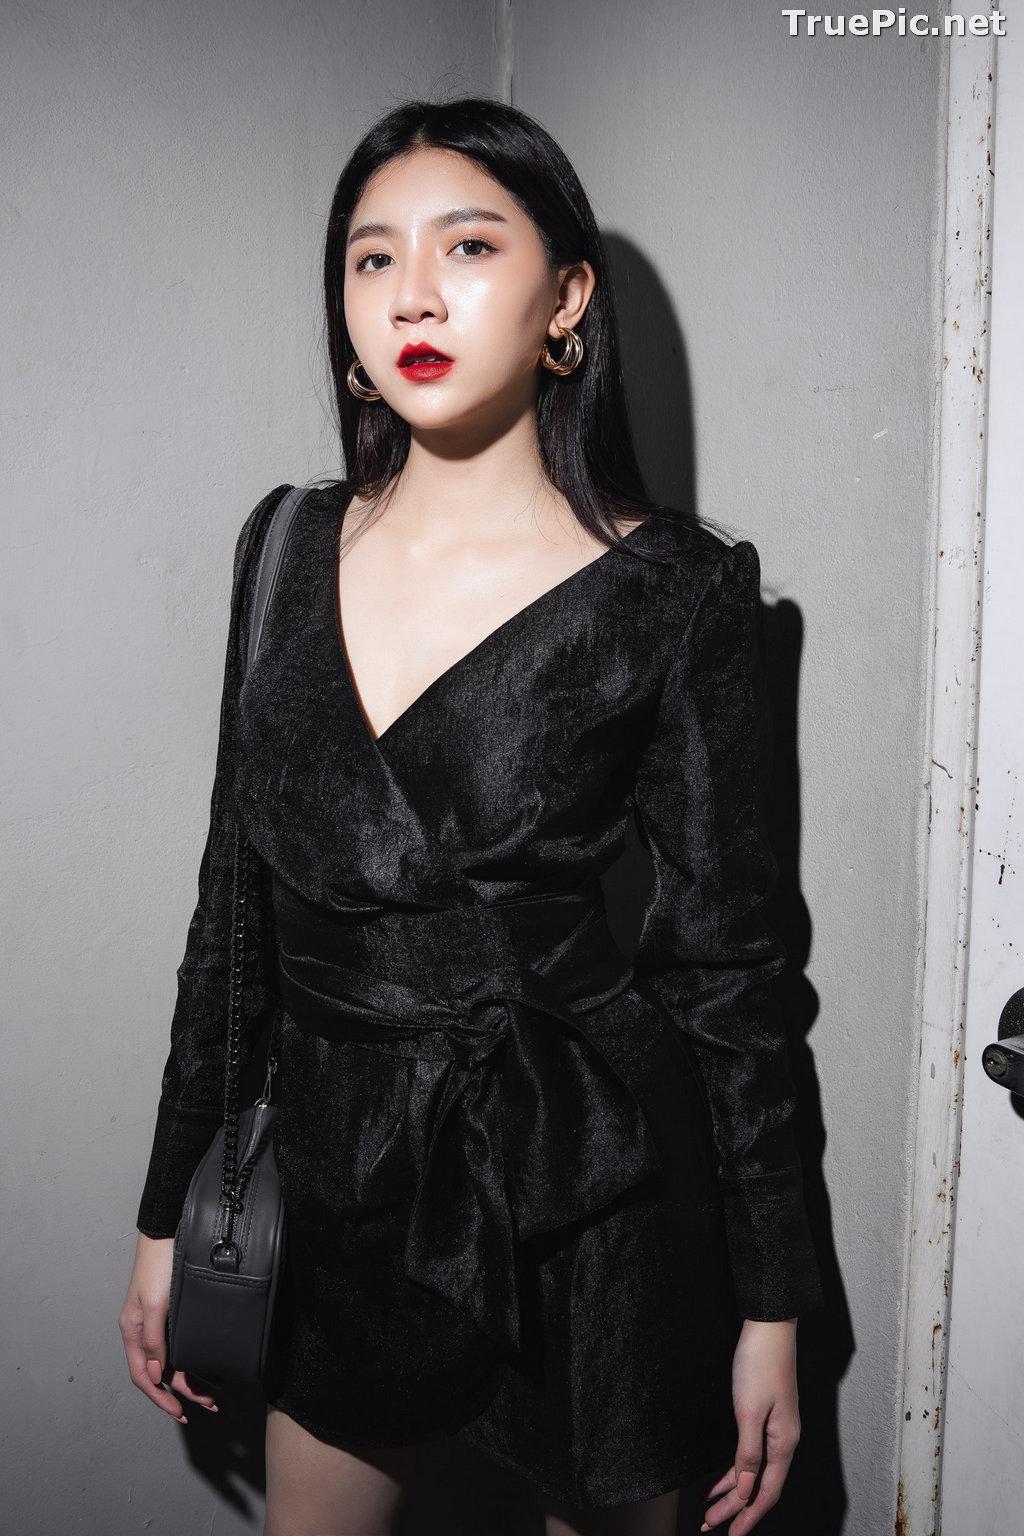 Image Thailand Model - Sasi Ngiunwan - Black For SiamNight - TruePic.net - Picture-12